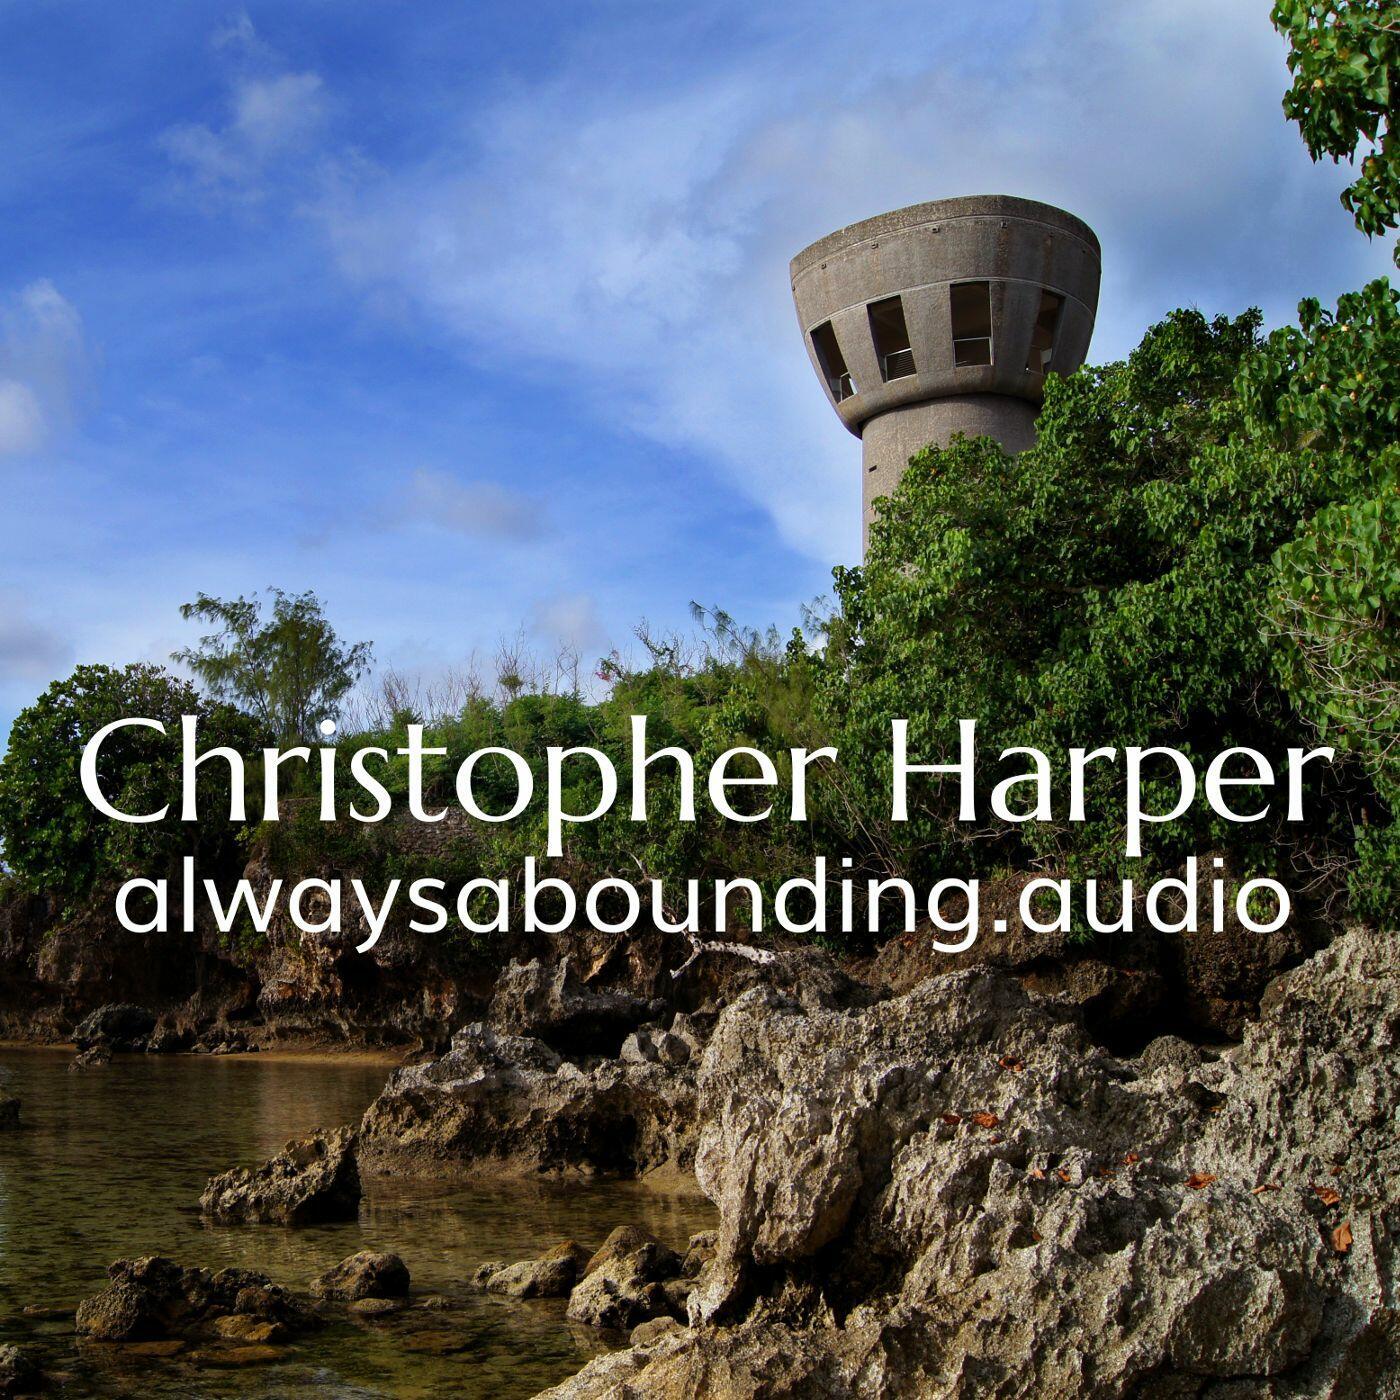 alwaysabounding.audio